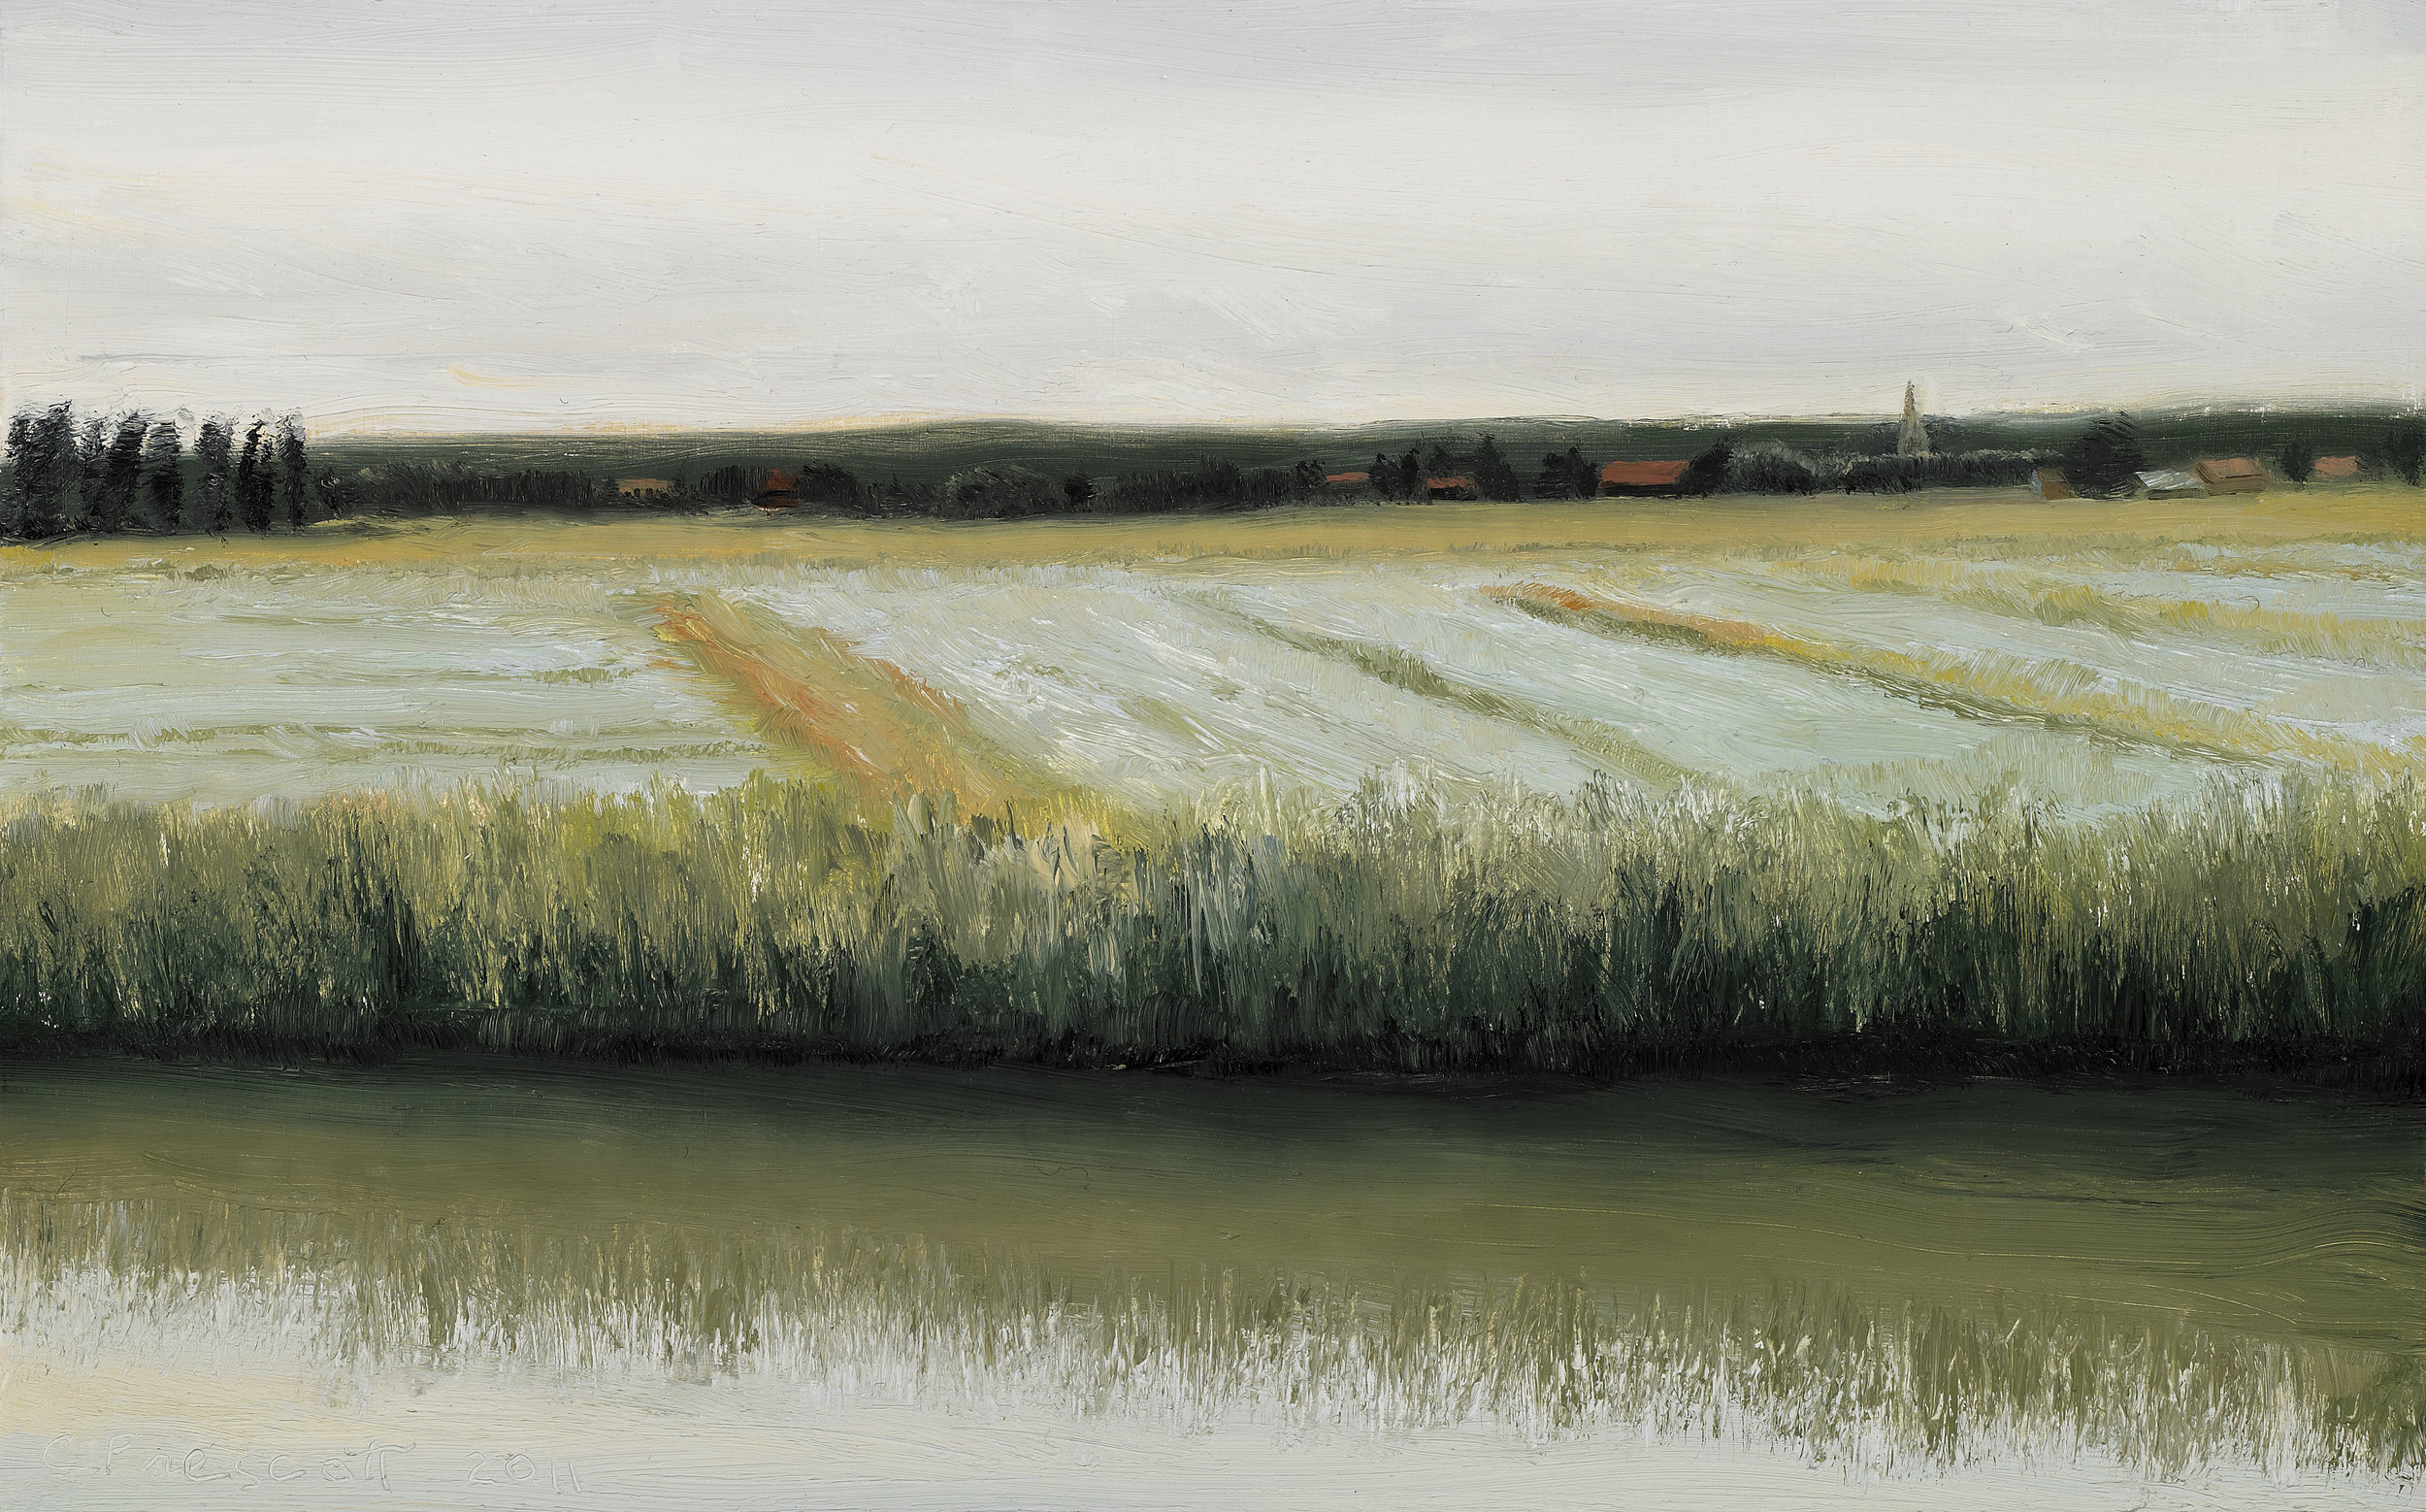 "Linen Fields Along the Calais Canal , Oil on Wood Panel, 2011, 5"" x 8"""